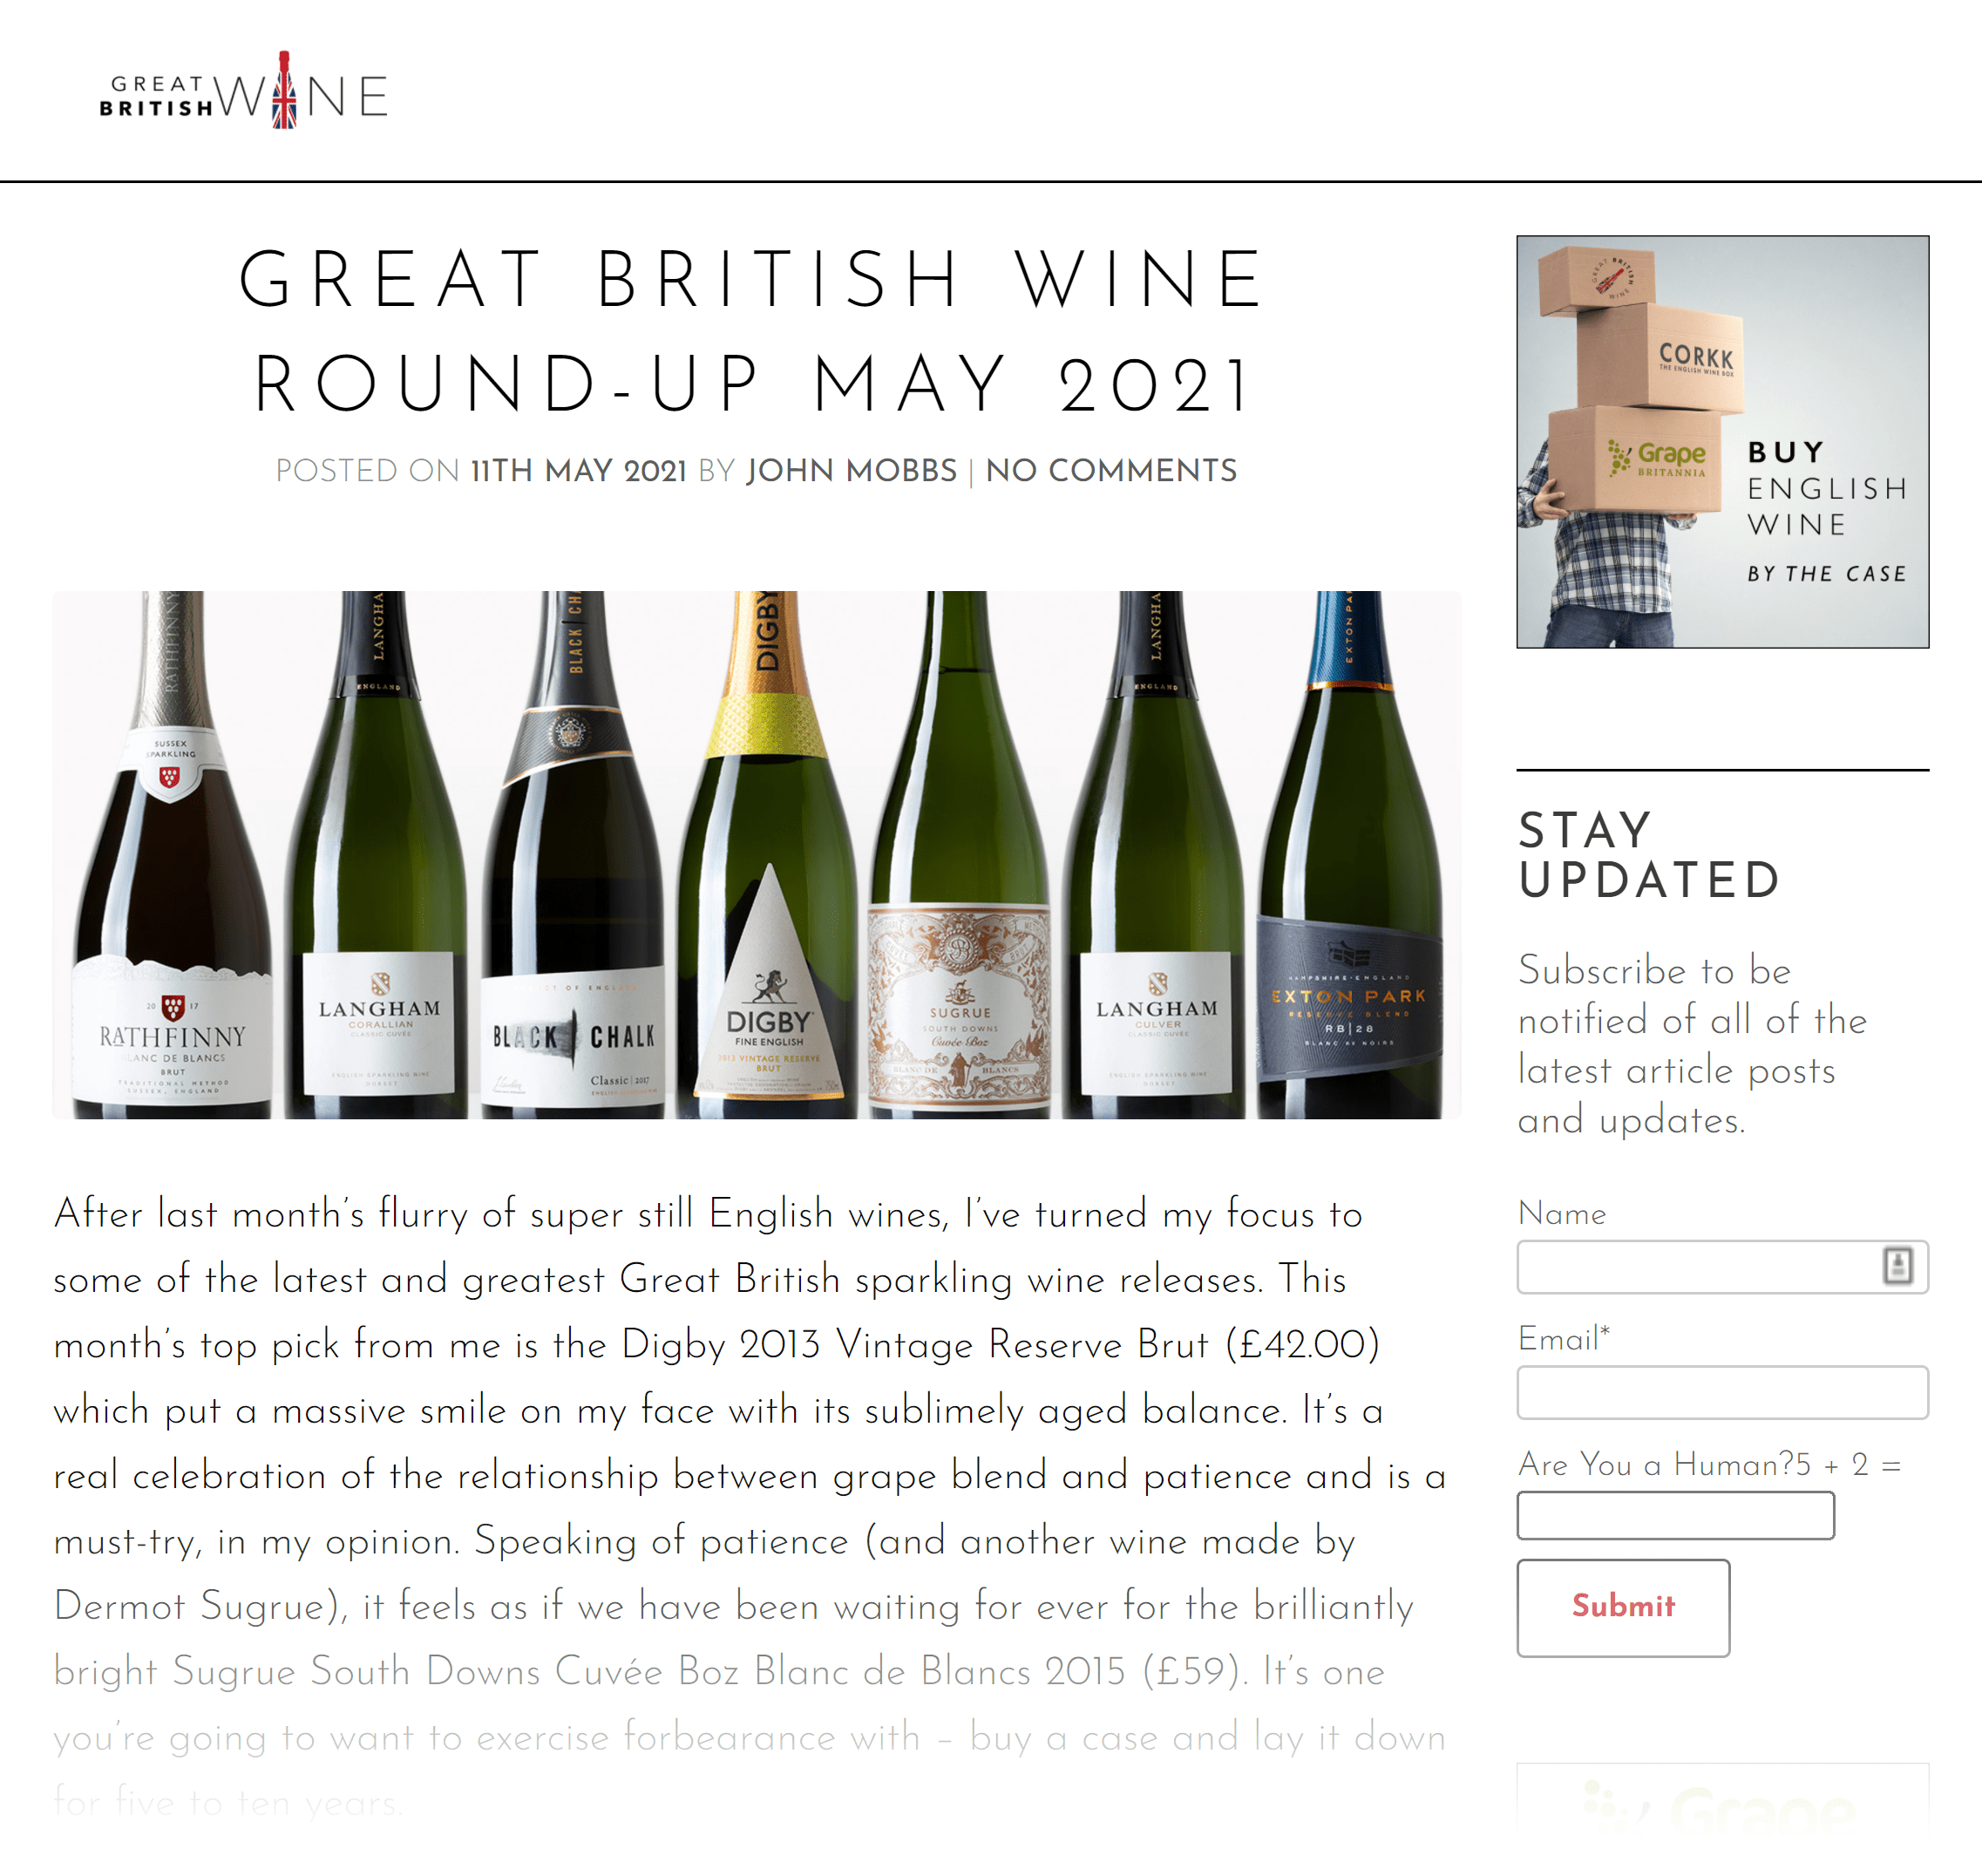 Great British Wine round-up